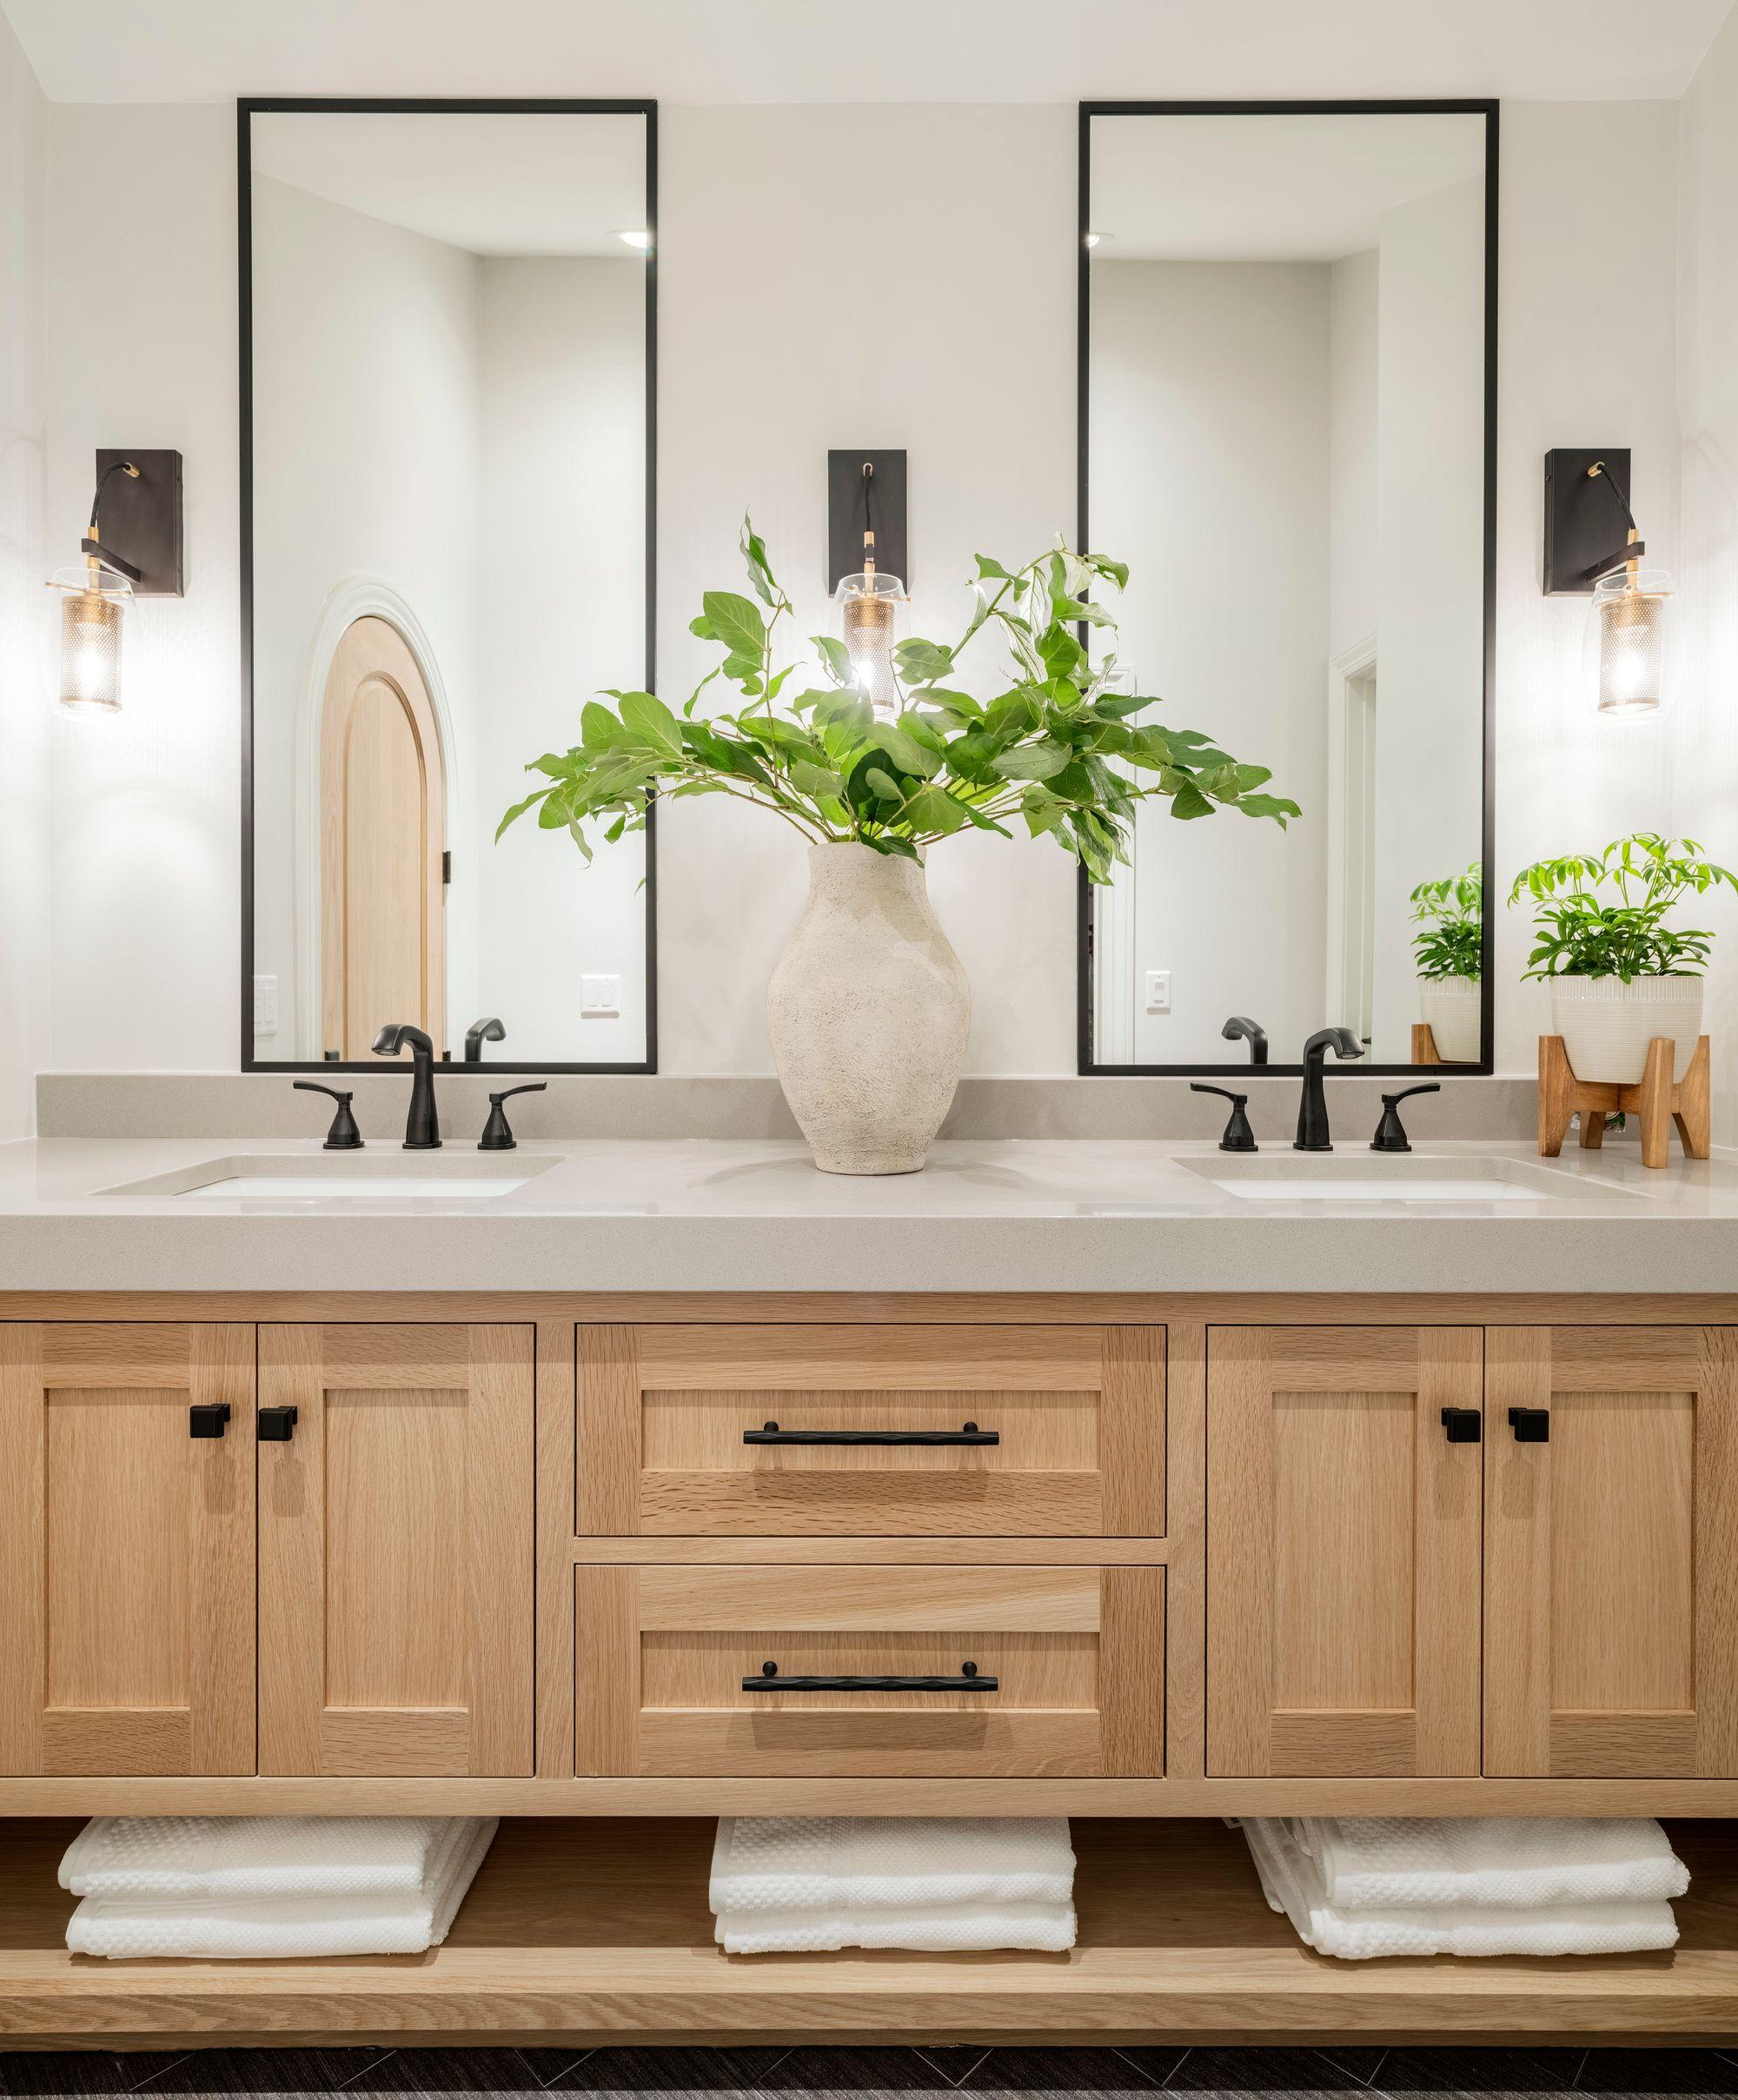 Modern Master Bathroom Bathroom Vanity Designs Master Bathroom Design Modern Master Bathroom [ 2416 x 2000 Pixel ]